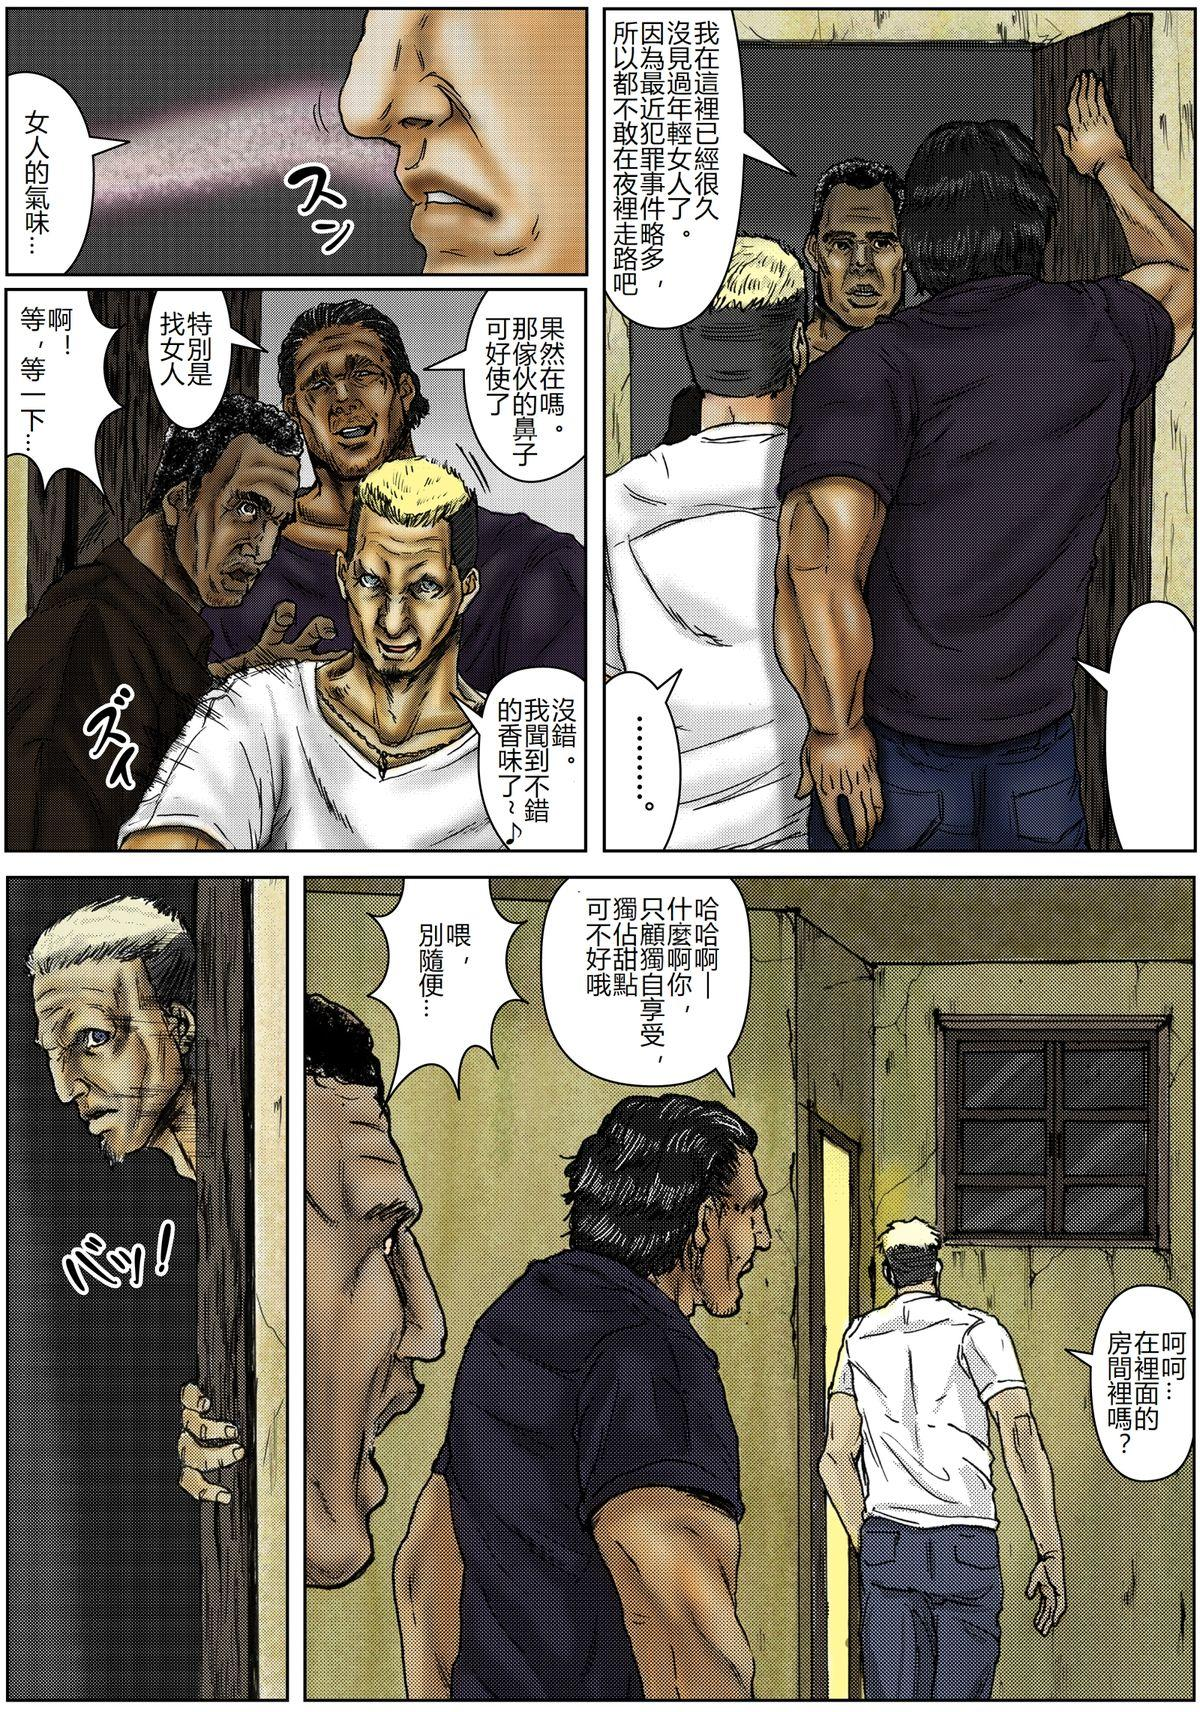 BODY HAZARD 5 Shushou Hen 5